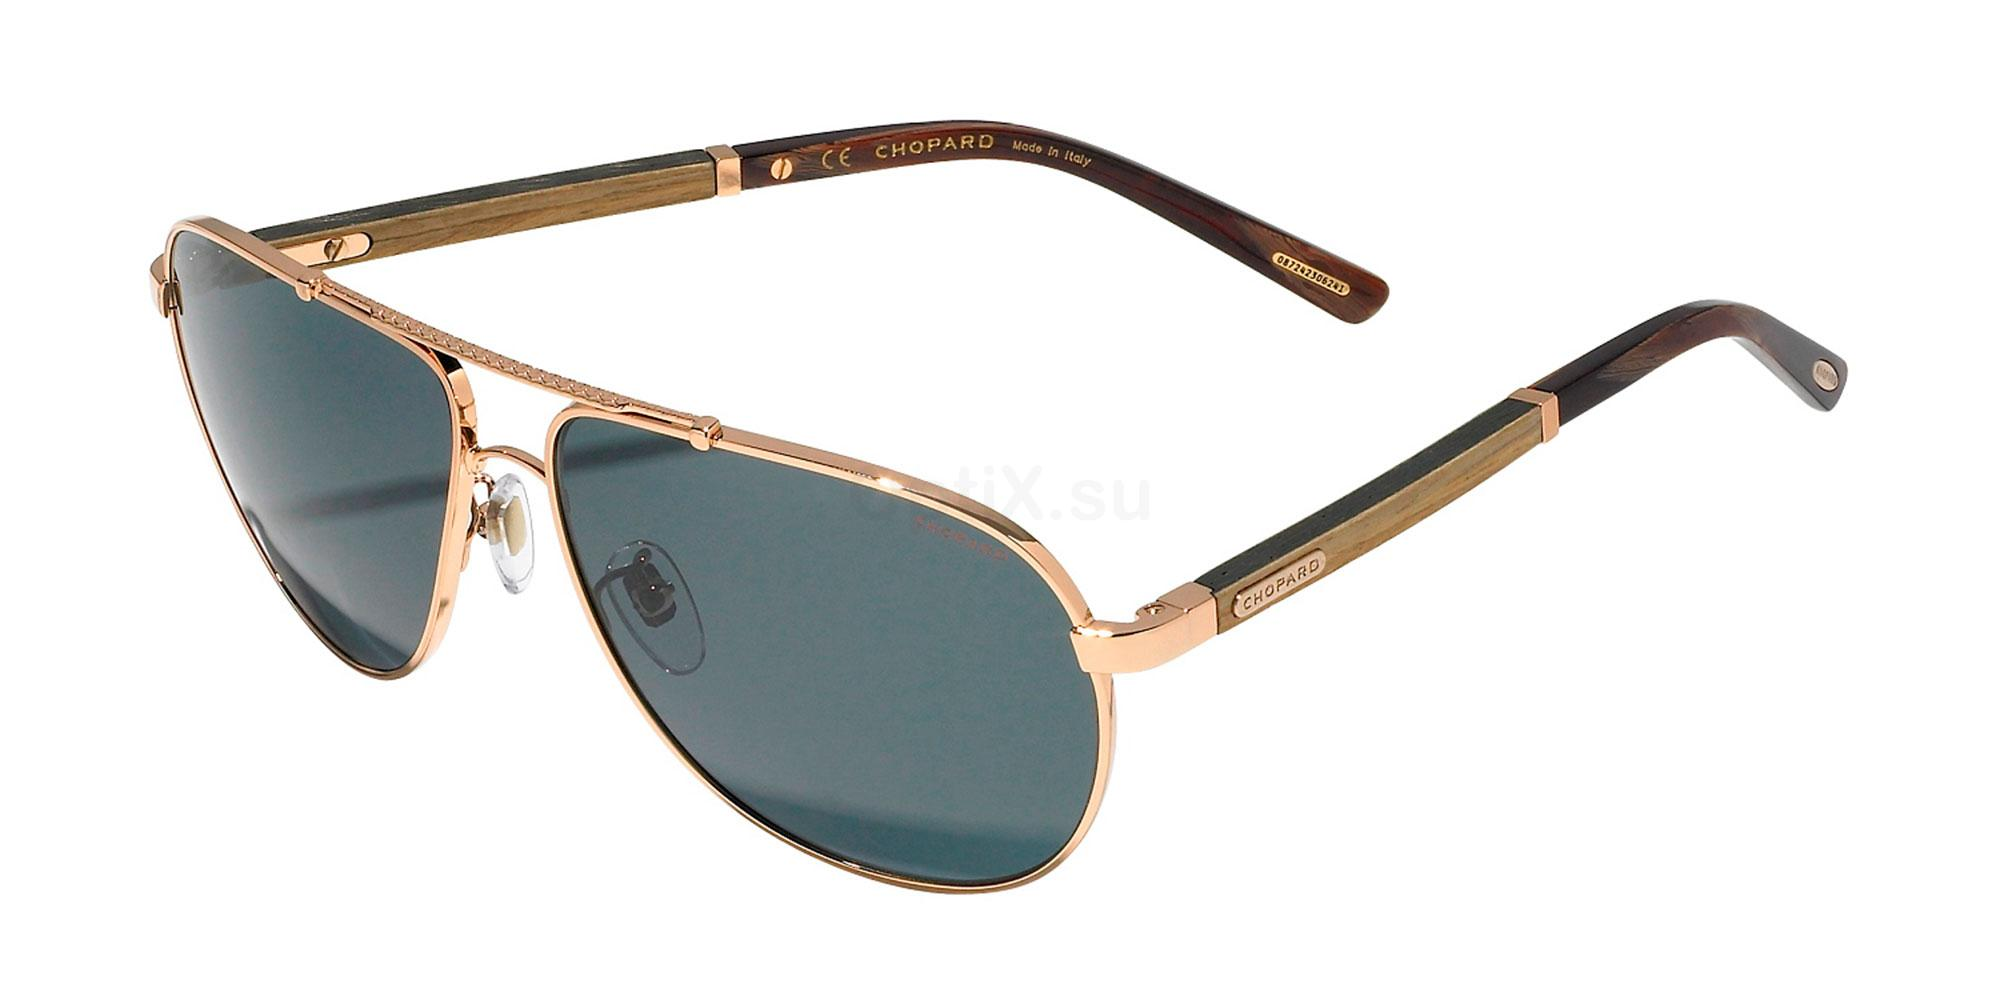 8FCP SCHB78V Sunglasses, Chopard